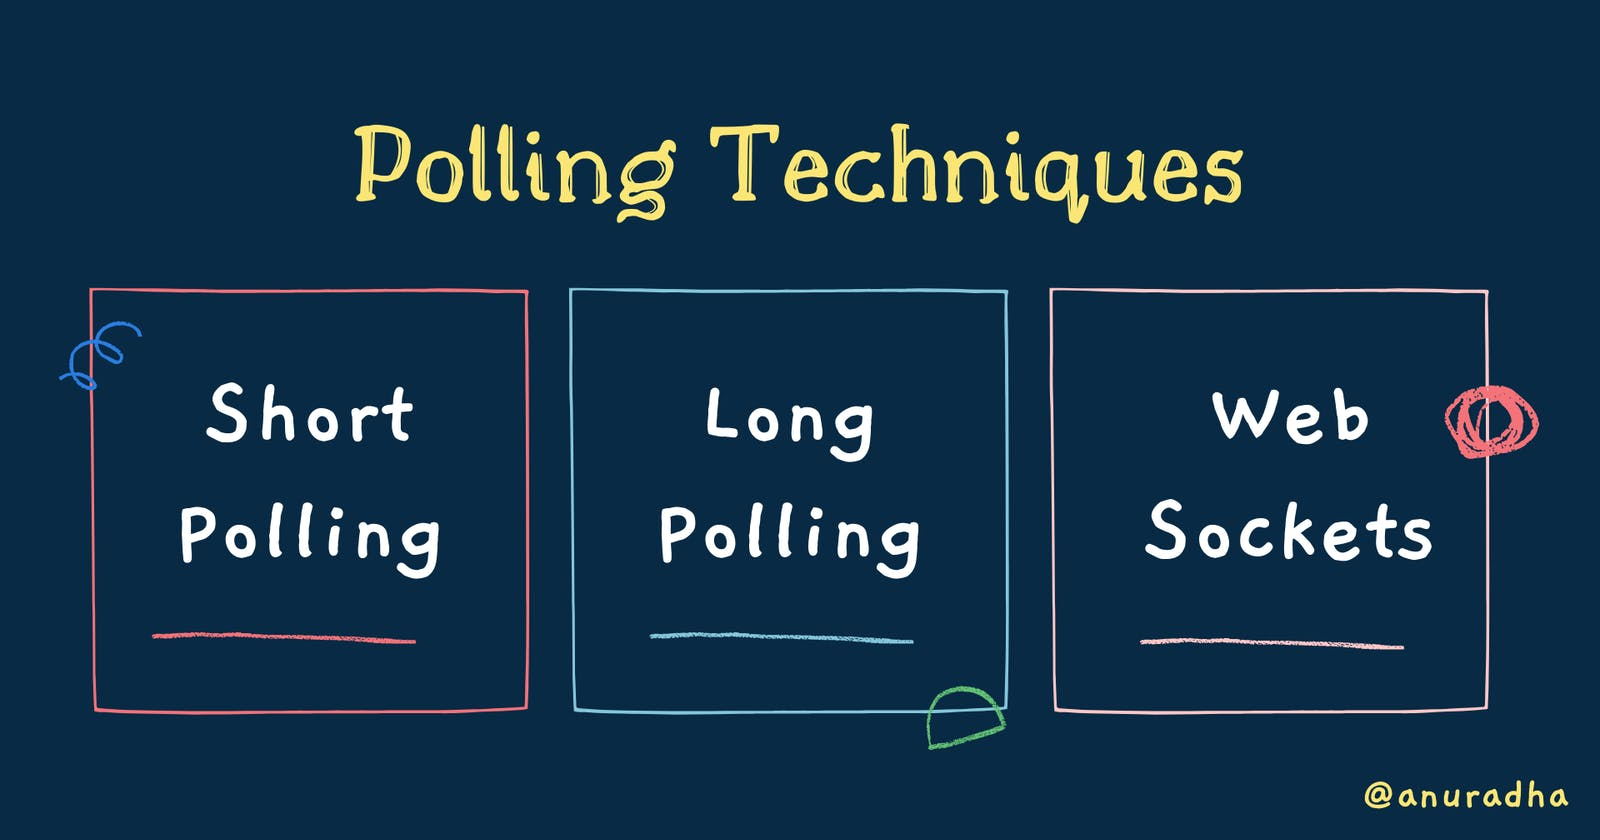 Short Polling vs Long Polling vs Web Sockets